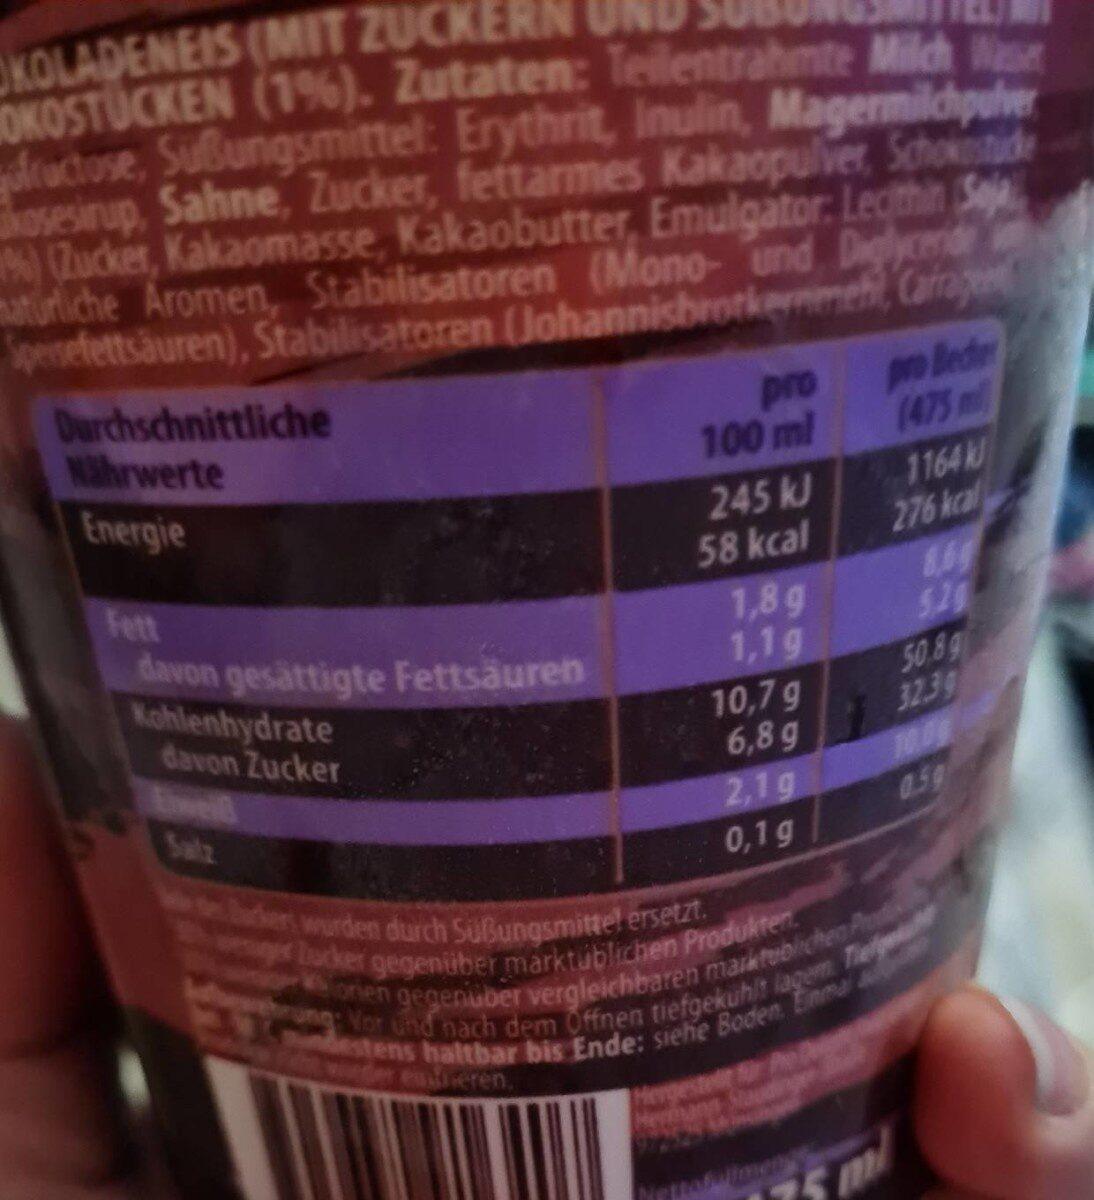 Callow's Creamy Chocolate - Nährwertangaben - de